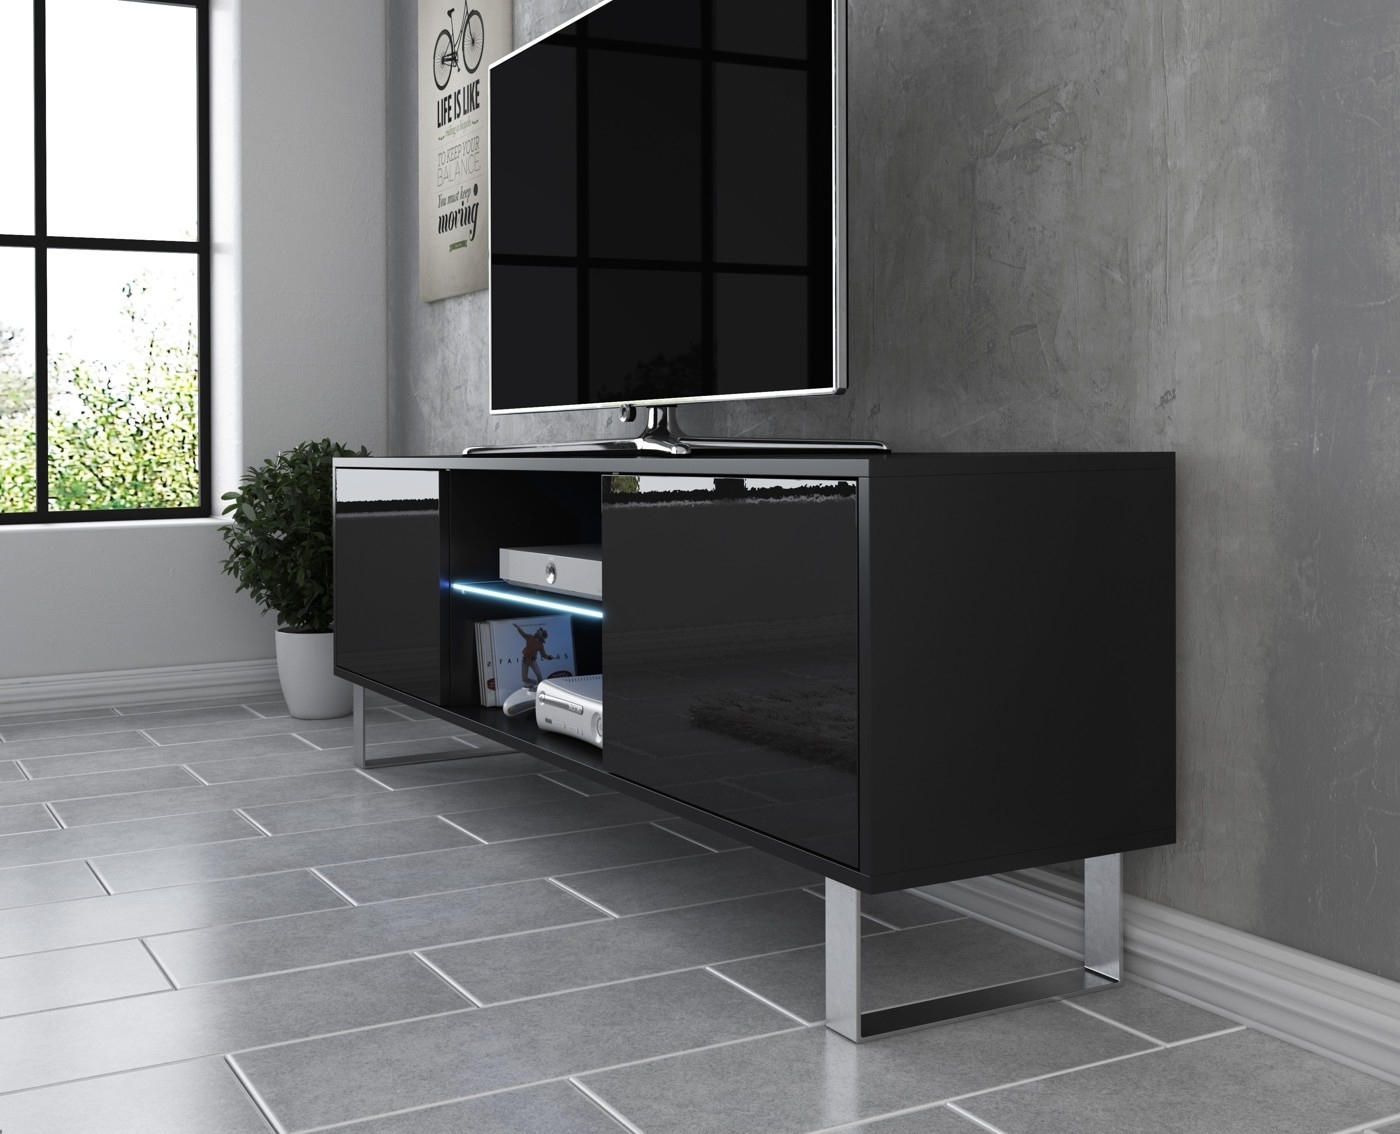 Tv meubel knight 2 zwart 160 cm meubella for Showroommodellen design meubels